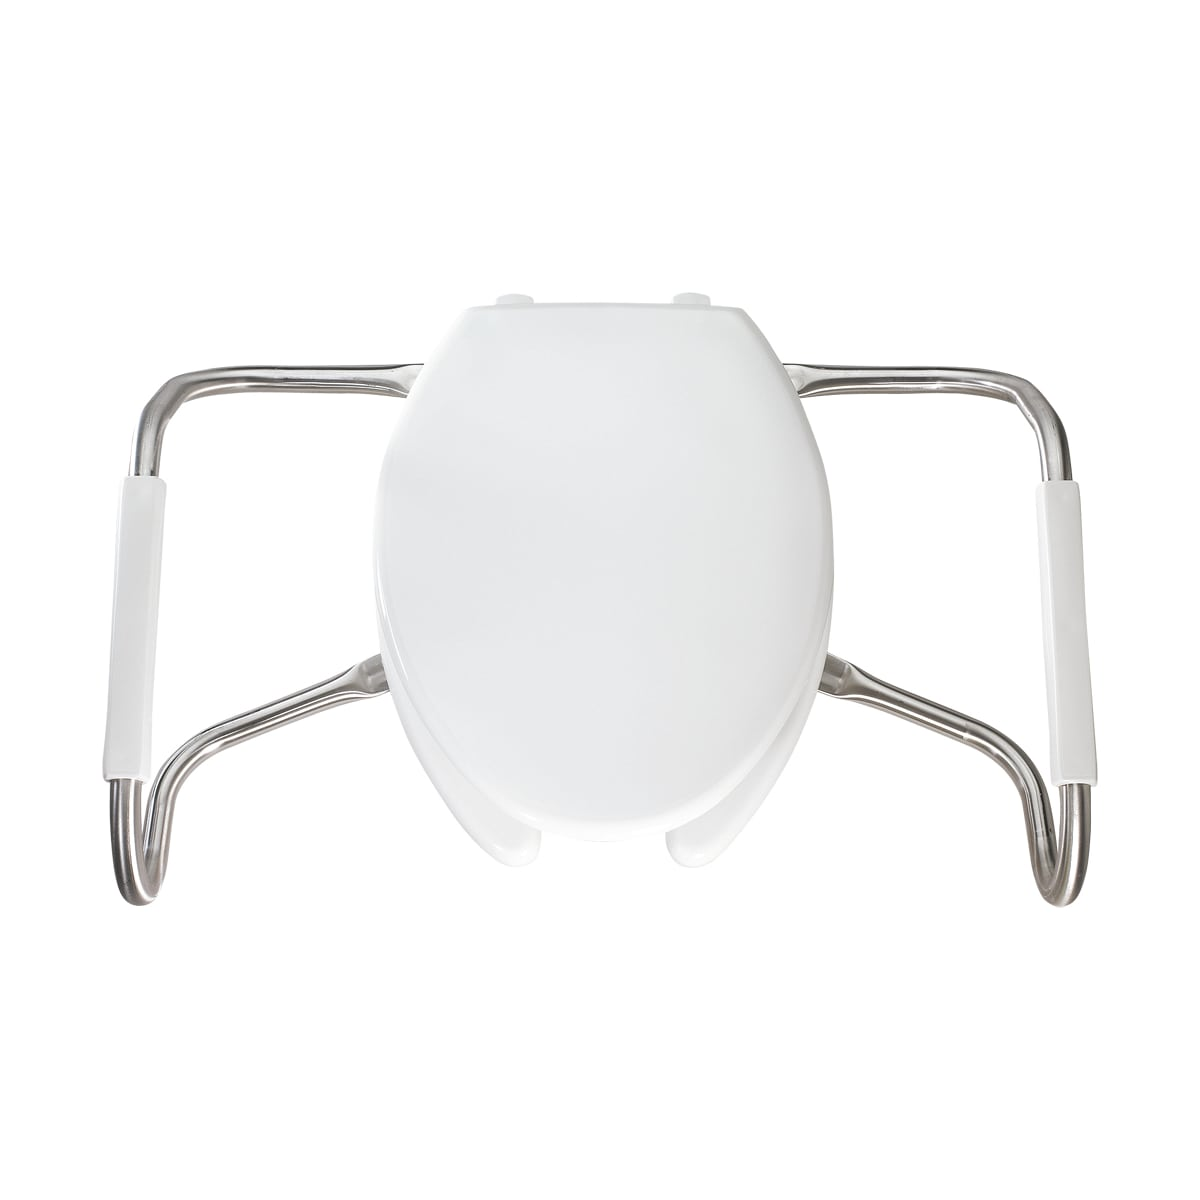 Stupendous Elongated Bemis Medic Aid 2 Lift Raised Open Front Plastic Creativecarmelina Interior Chair Design Creativecarmelinacom